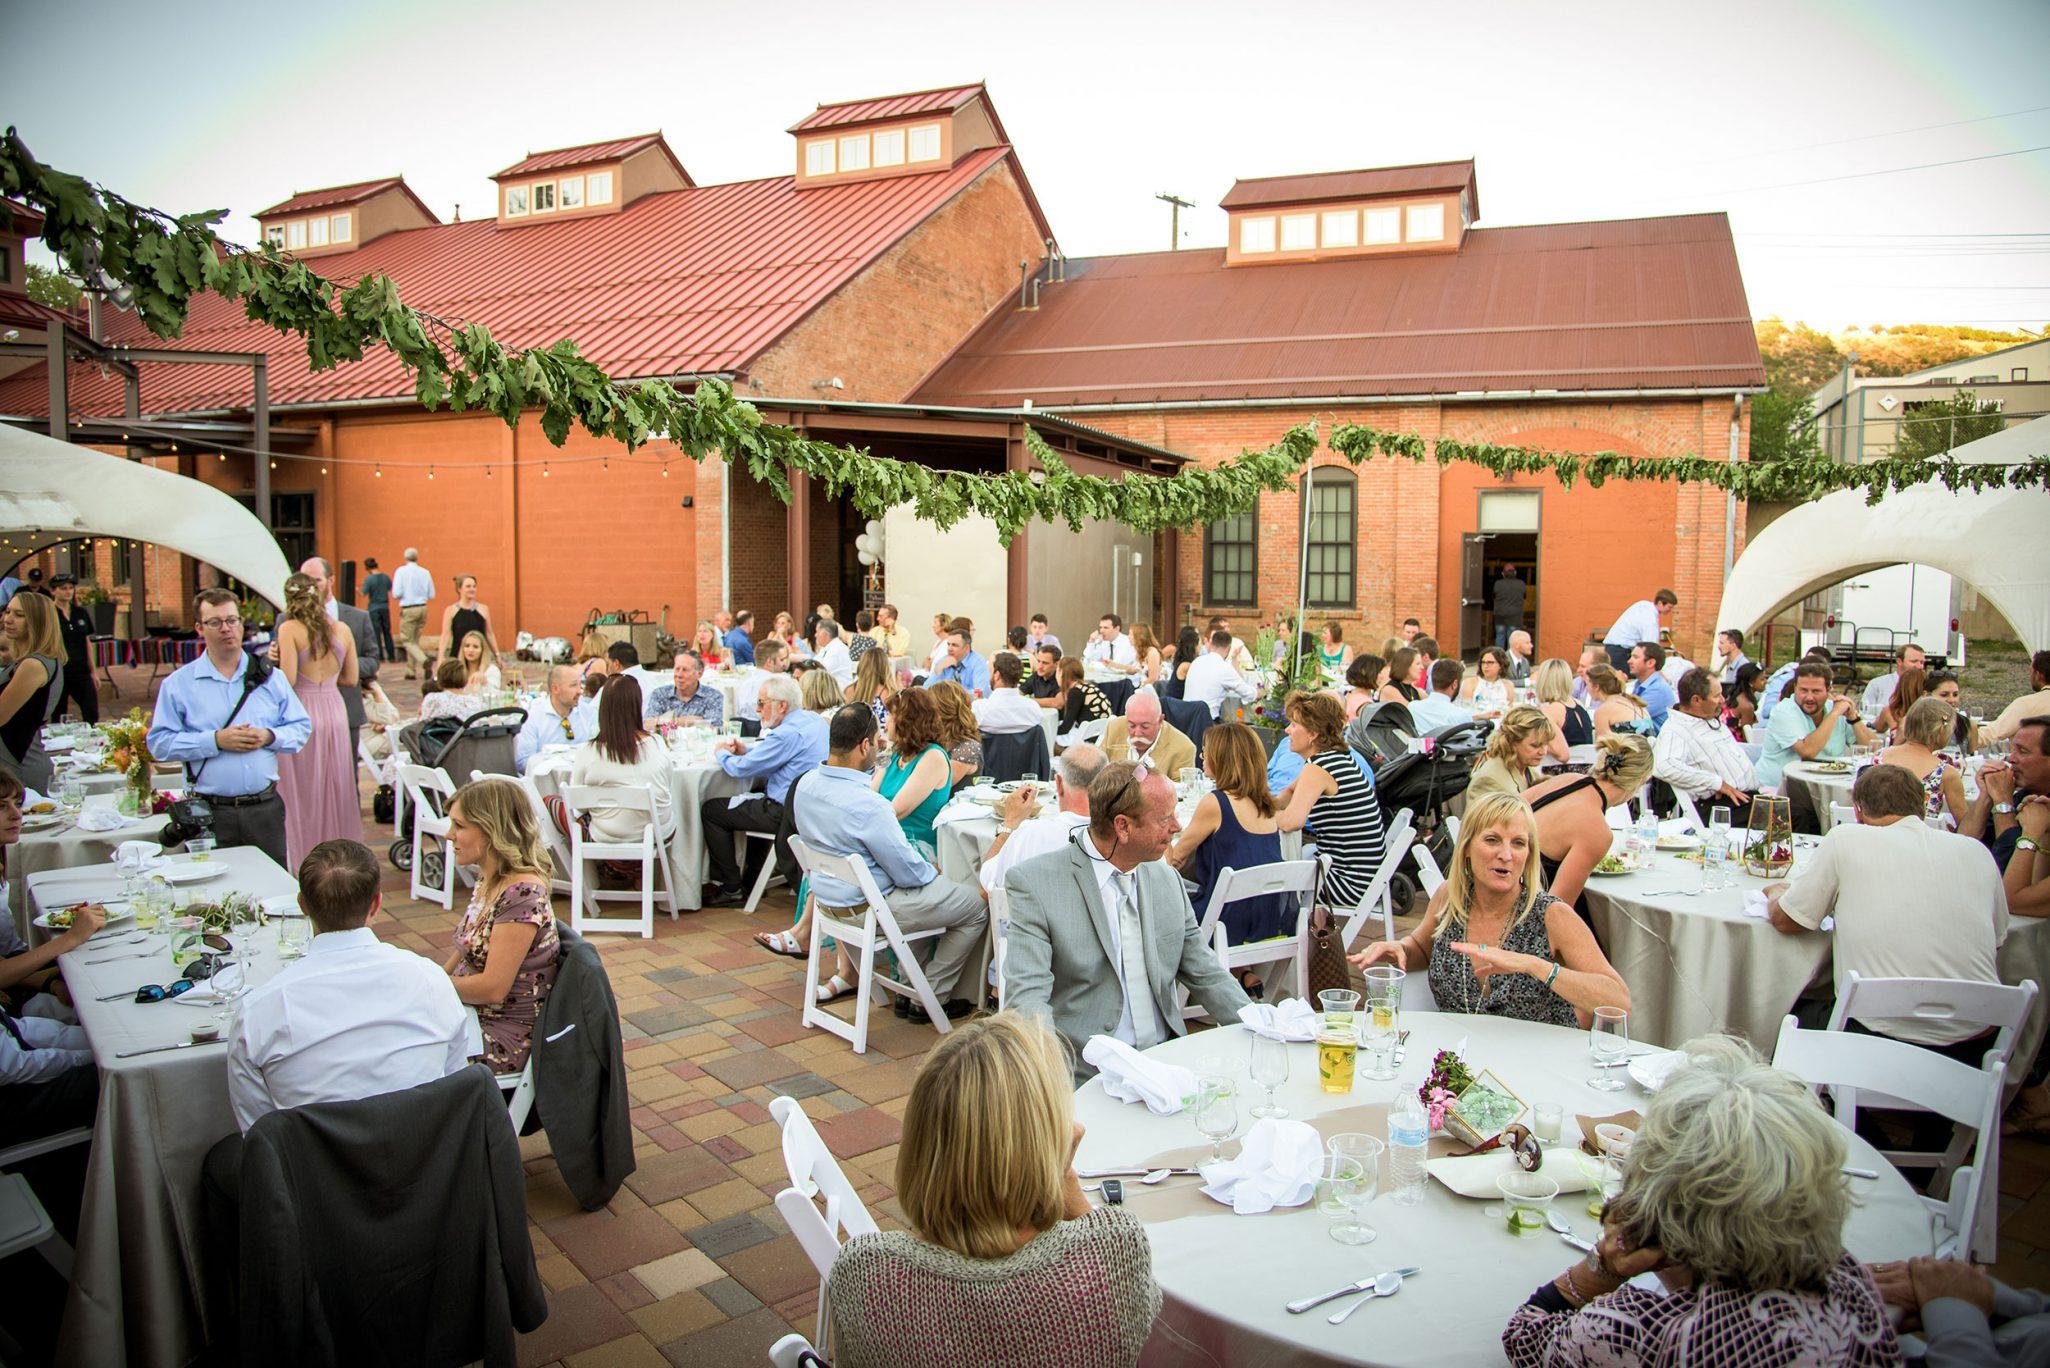 Wedding reception at the Powerhouse Science Museum Wedding ceremony via Durango Weddings Magazine